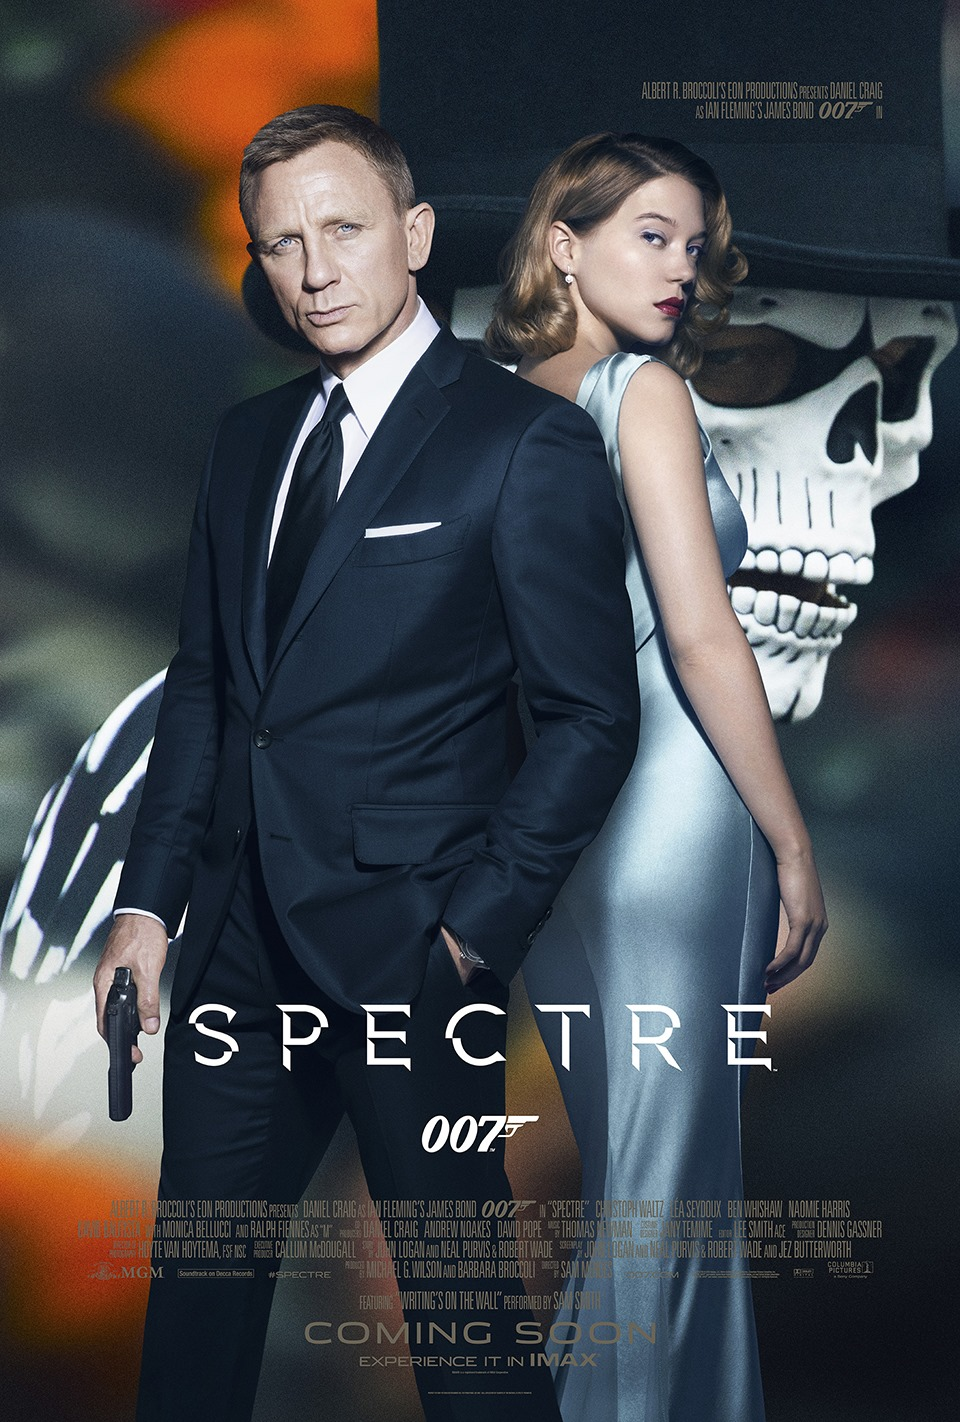 SPECTRE - Film Poster